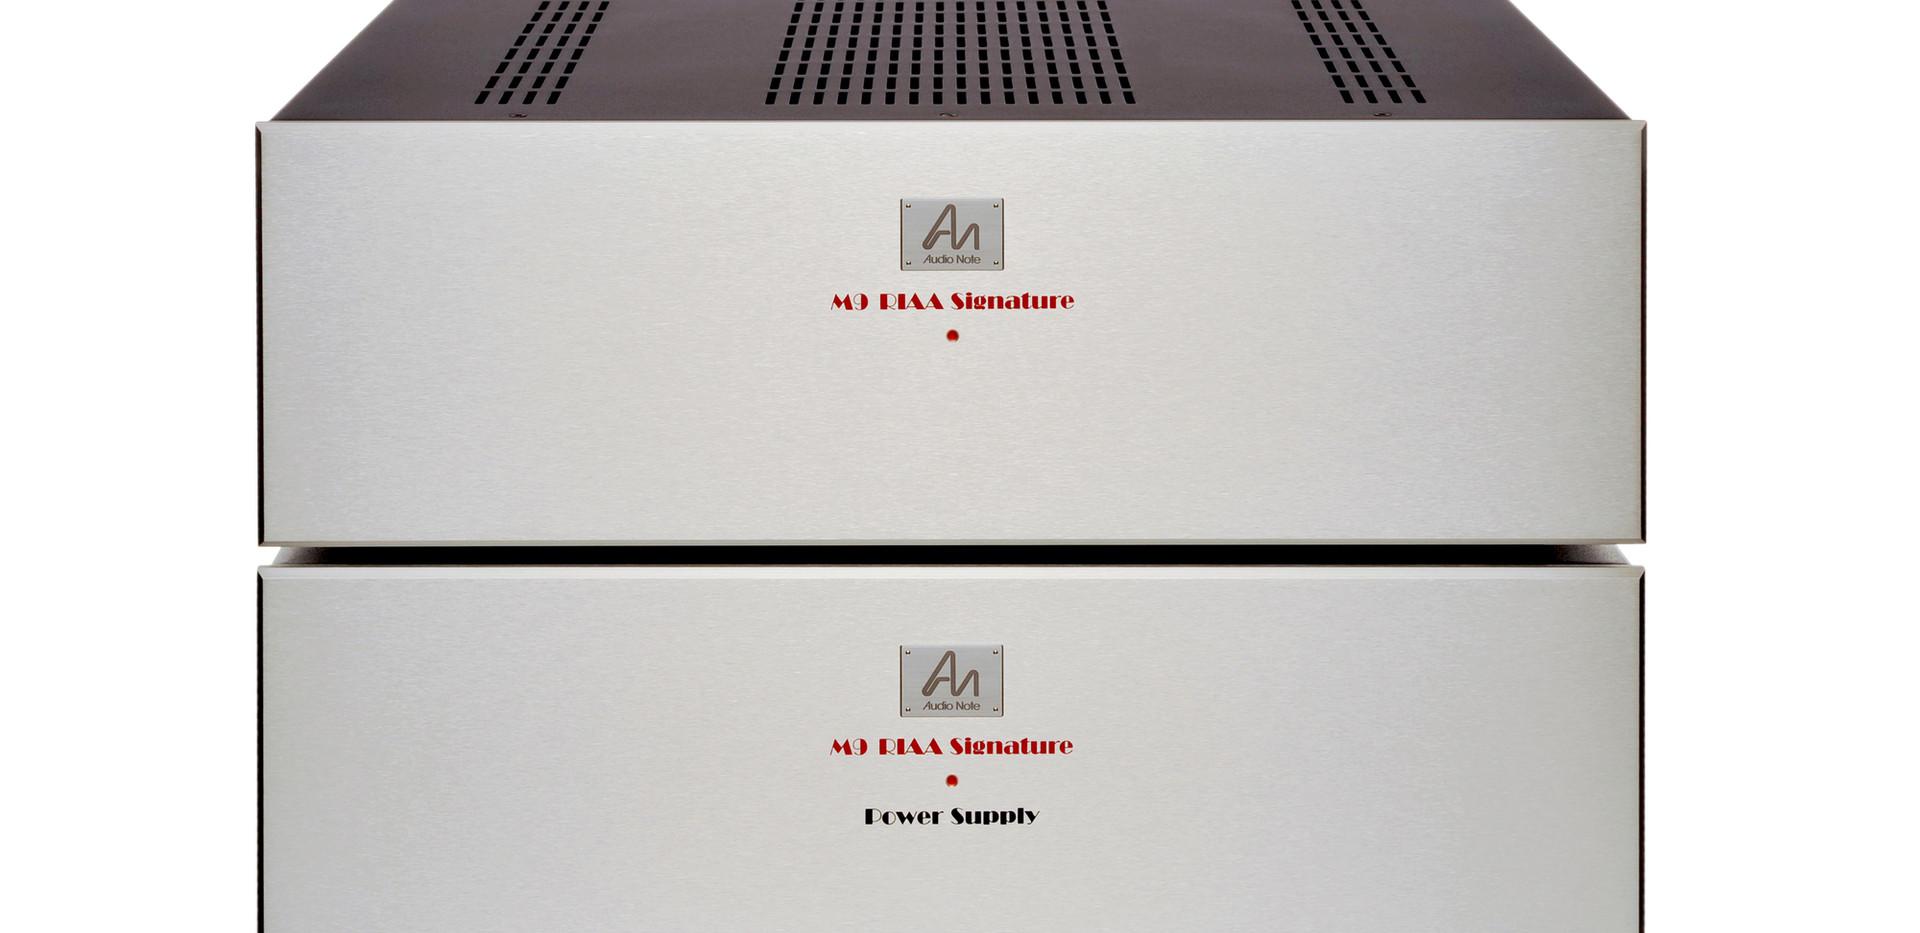 M9 RIAA Signature stack front top 1 edit